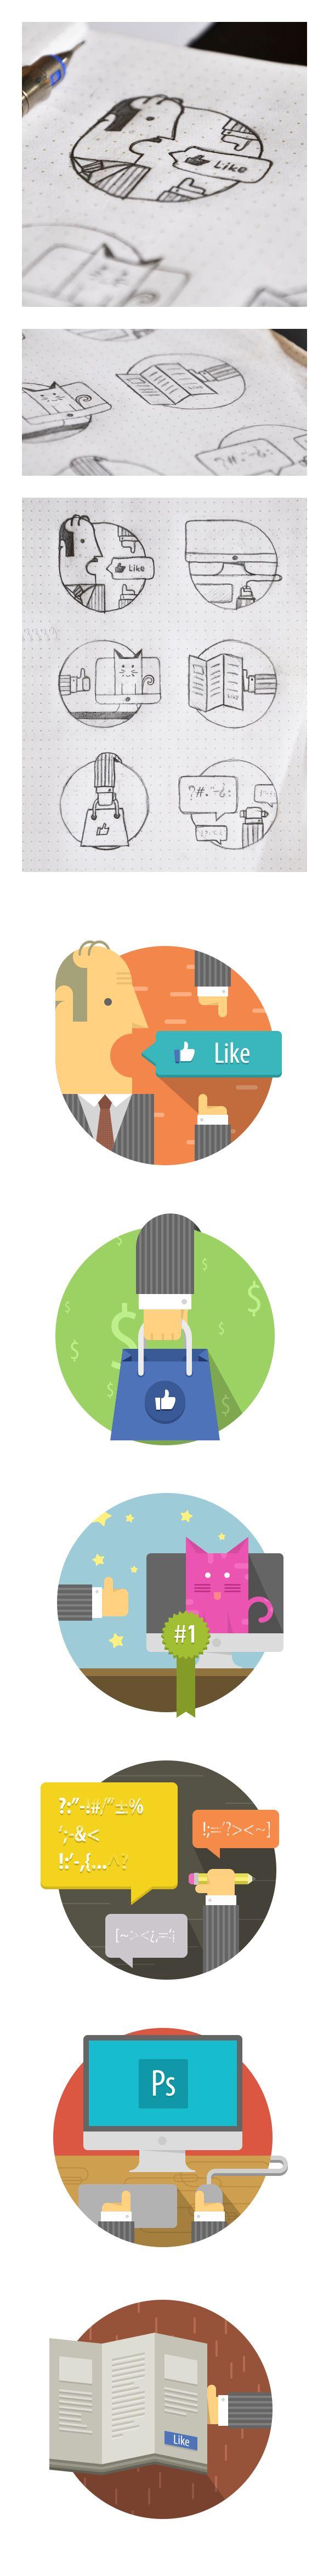 6 social marketing sins by Studio4 , via Behance